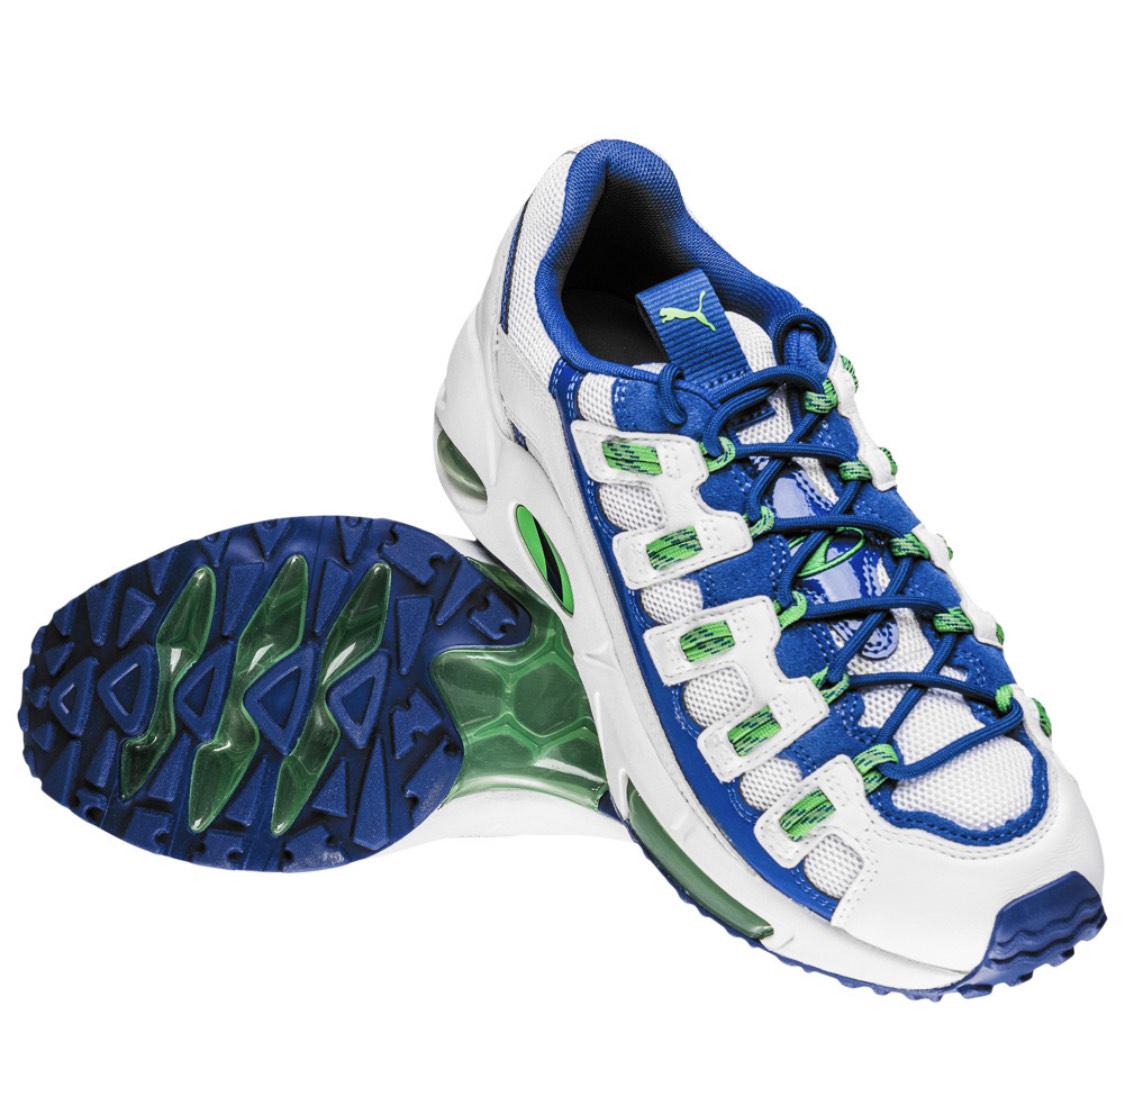 PUMA Cell Endura Patent 98 Sneakers maat 37 t/m 46 @ sport-korting.nl